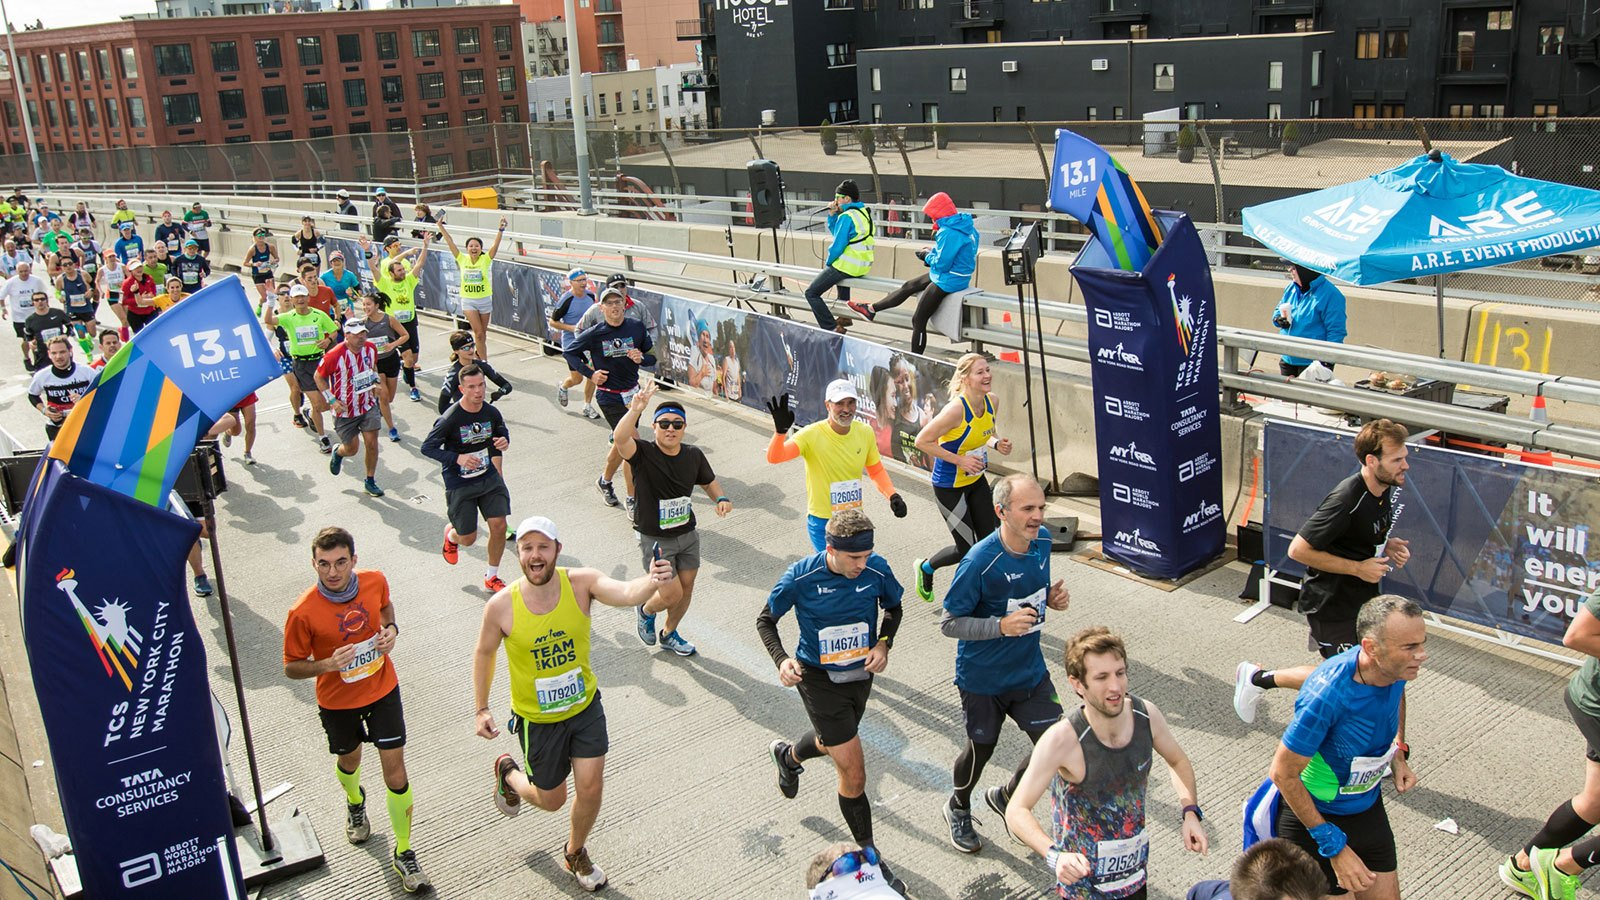 maraton nueva york 2021 central park majors